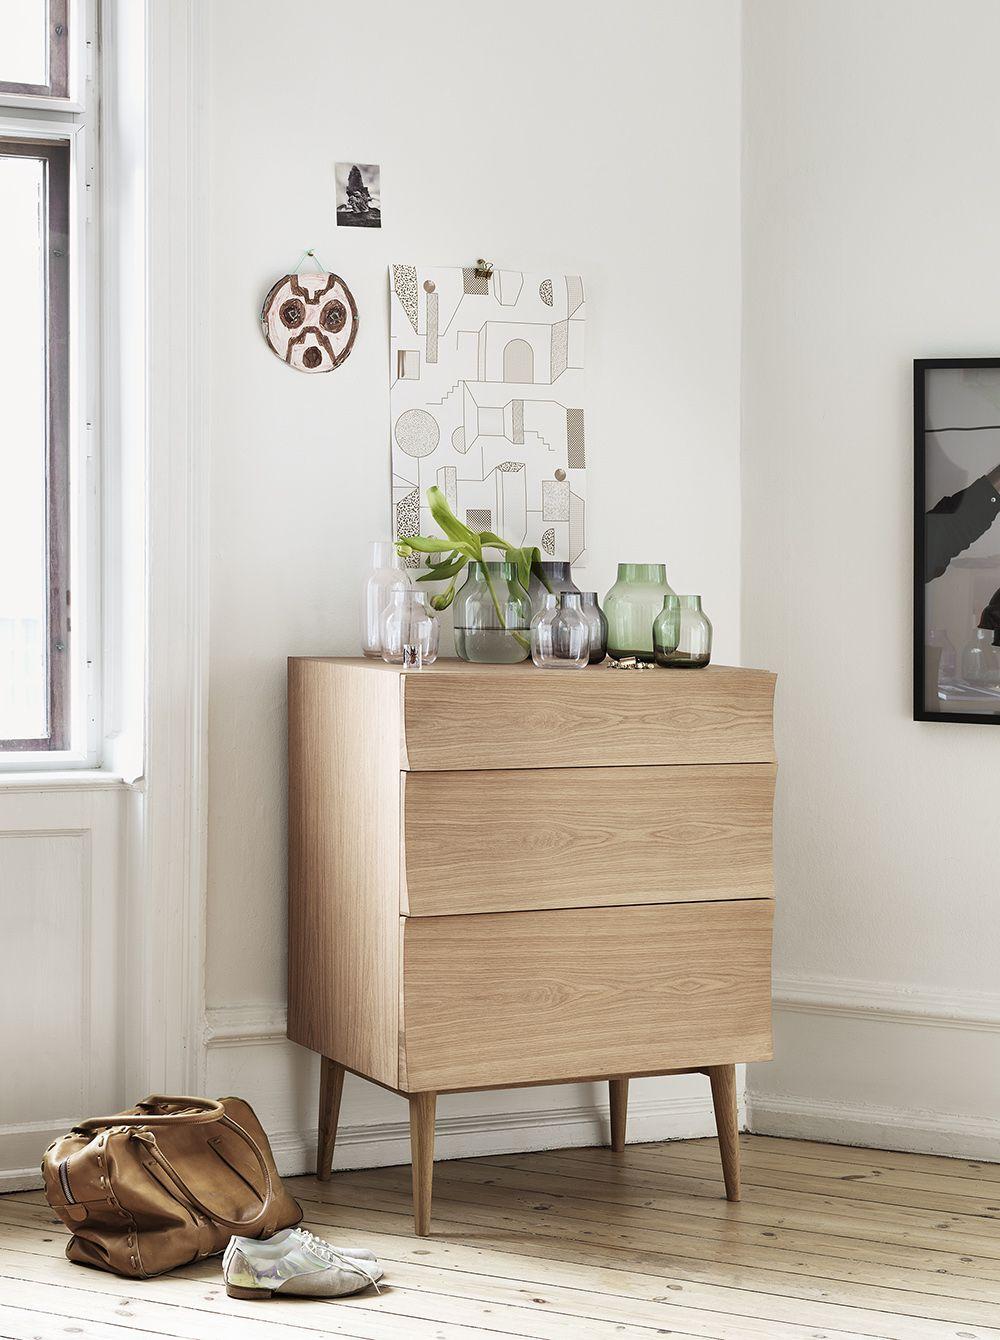 Search Urban Couture Designer Homewares Furniture Online Small Sideboard Furniture Design Drawer Design